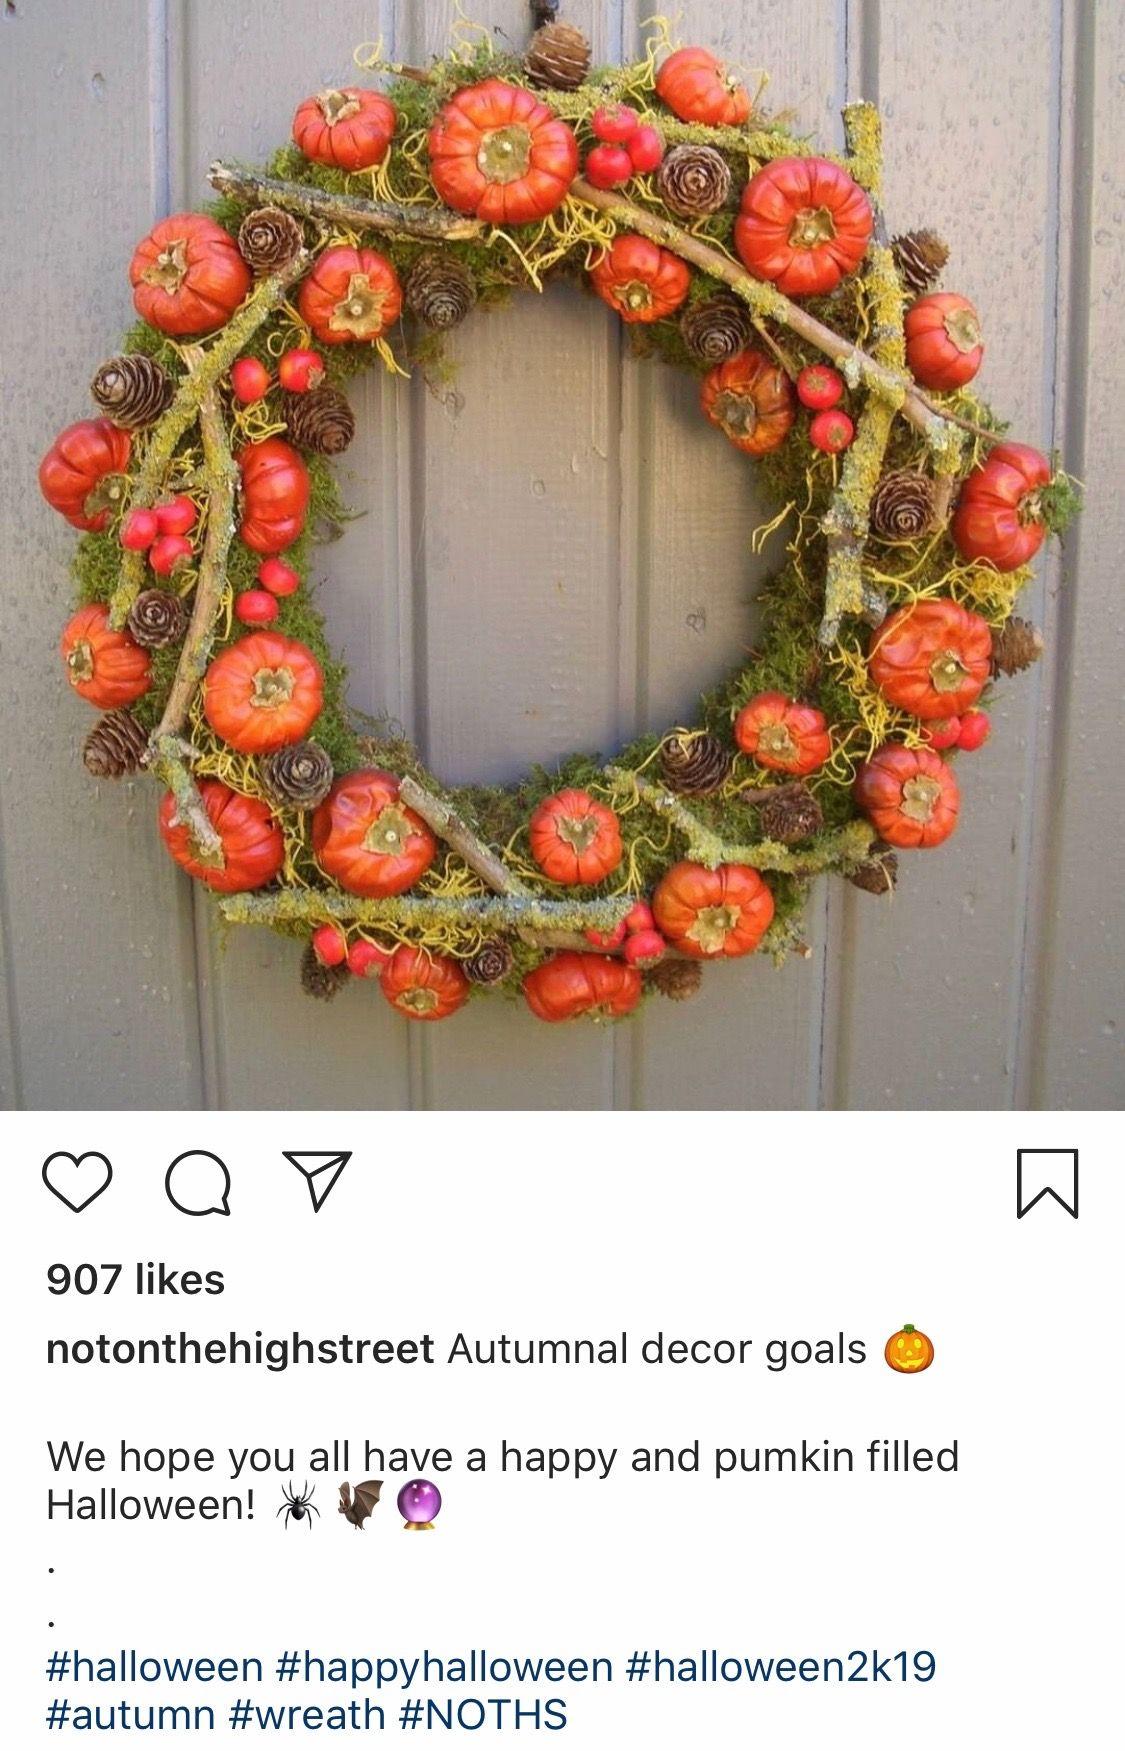 @notonthehighstreet media and description on an Instagram post